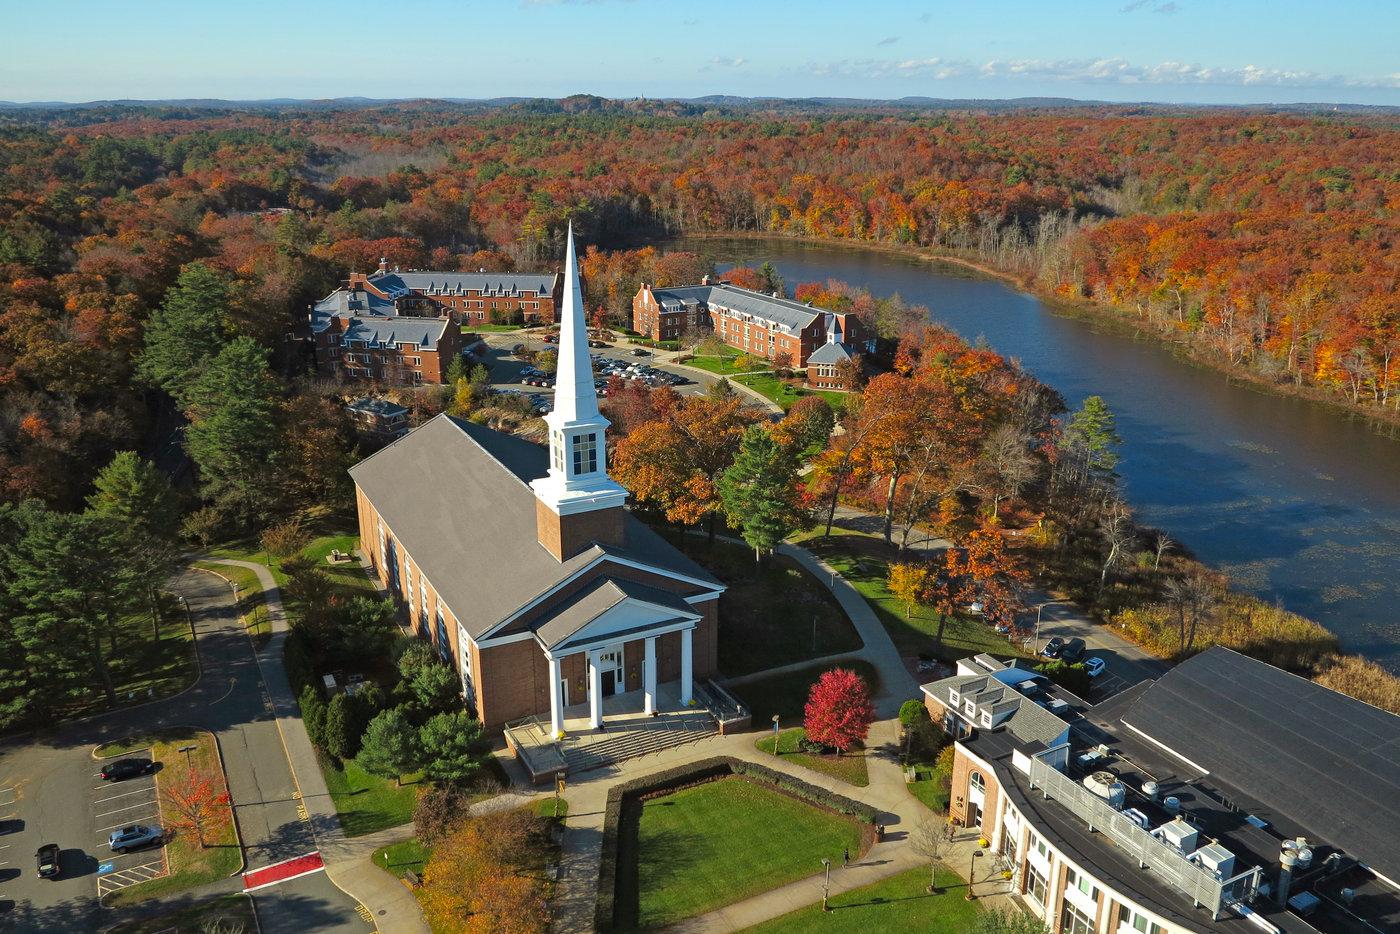 CCCU Statement on Deweese-Boyd v. Gordon College Lawsuit